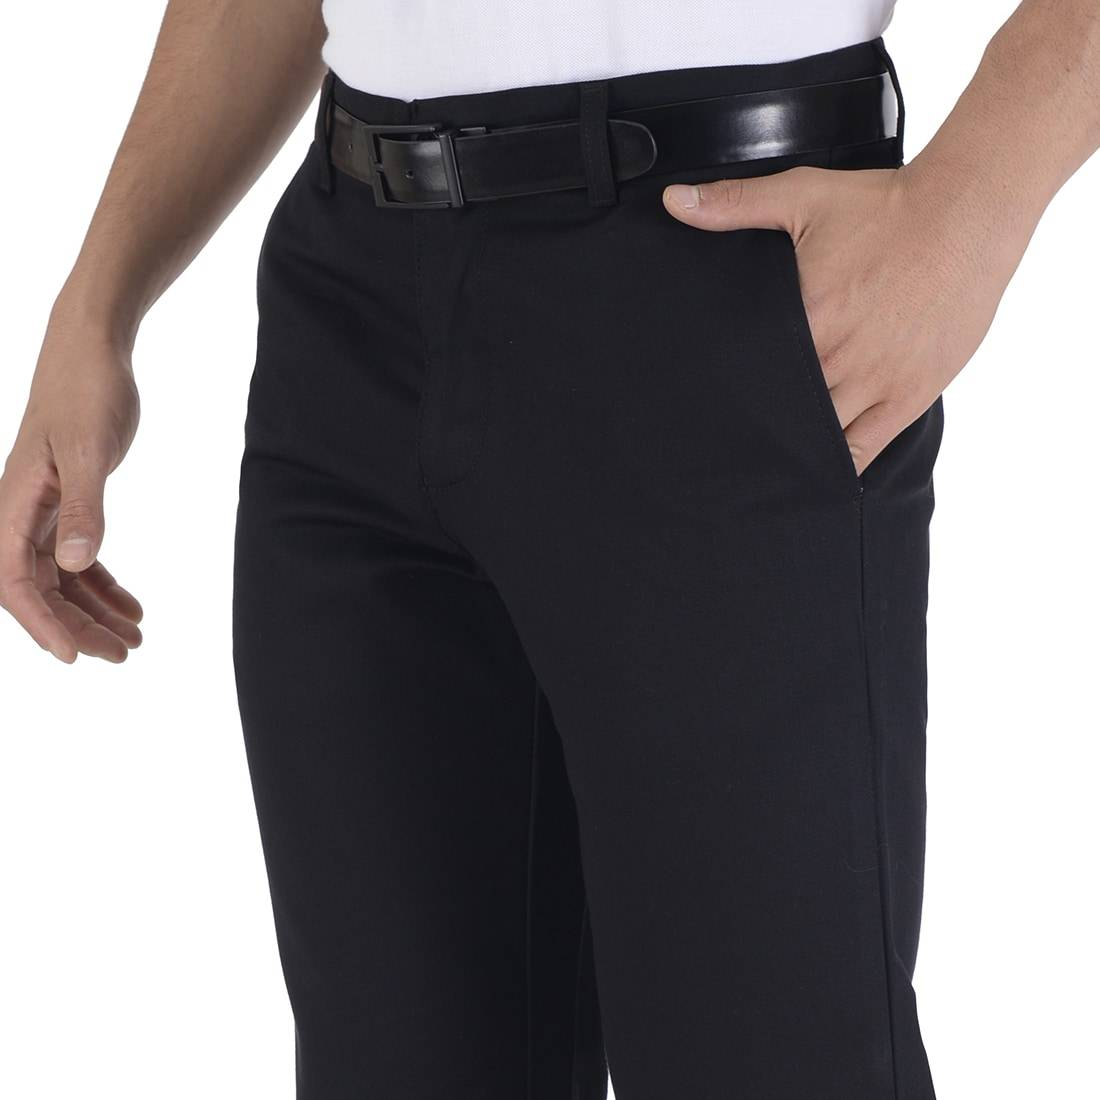 010789055209-03-Pantalon-Casual-Classic-Fit-Negro-yale